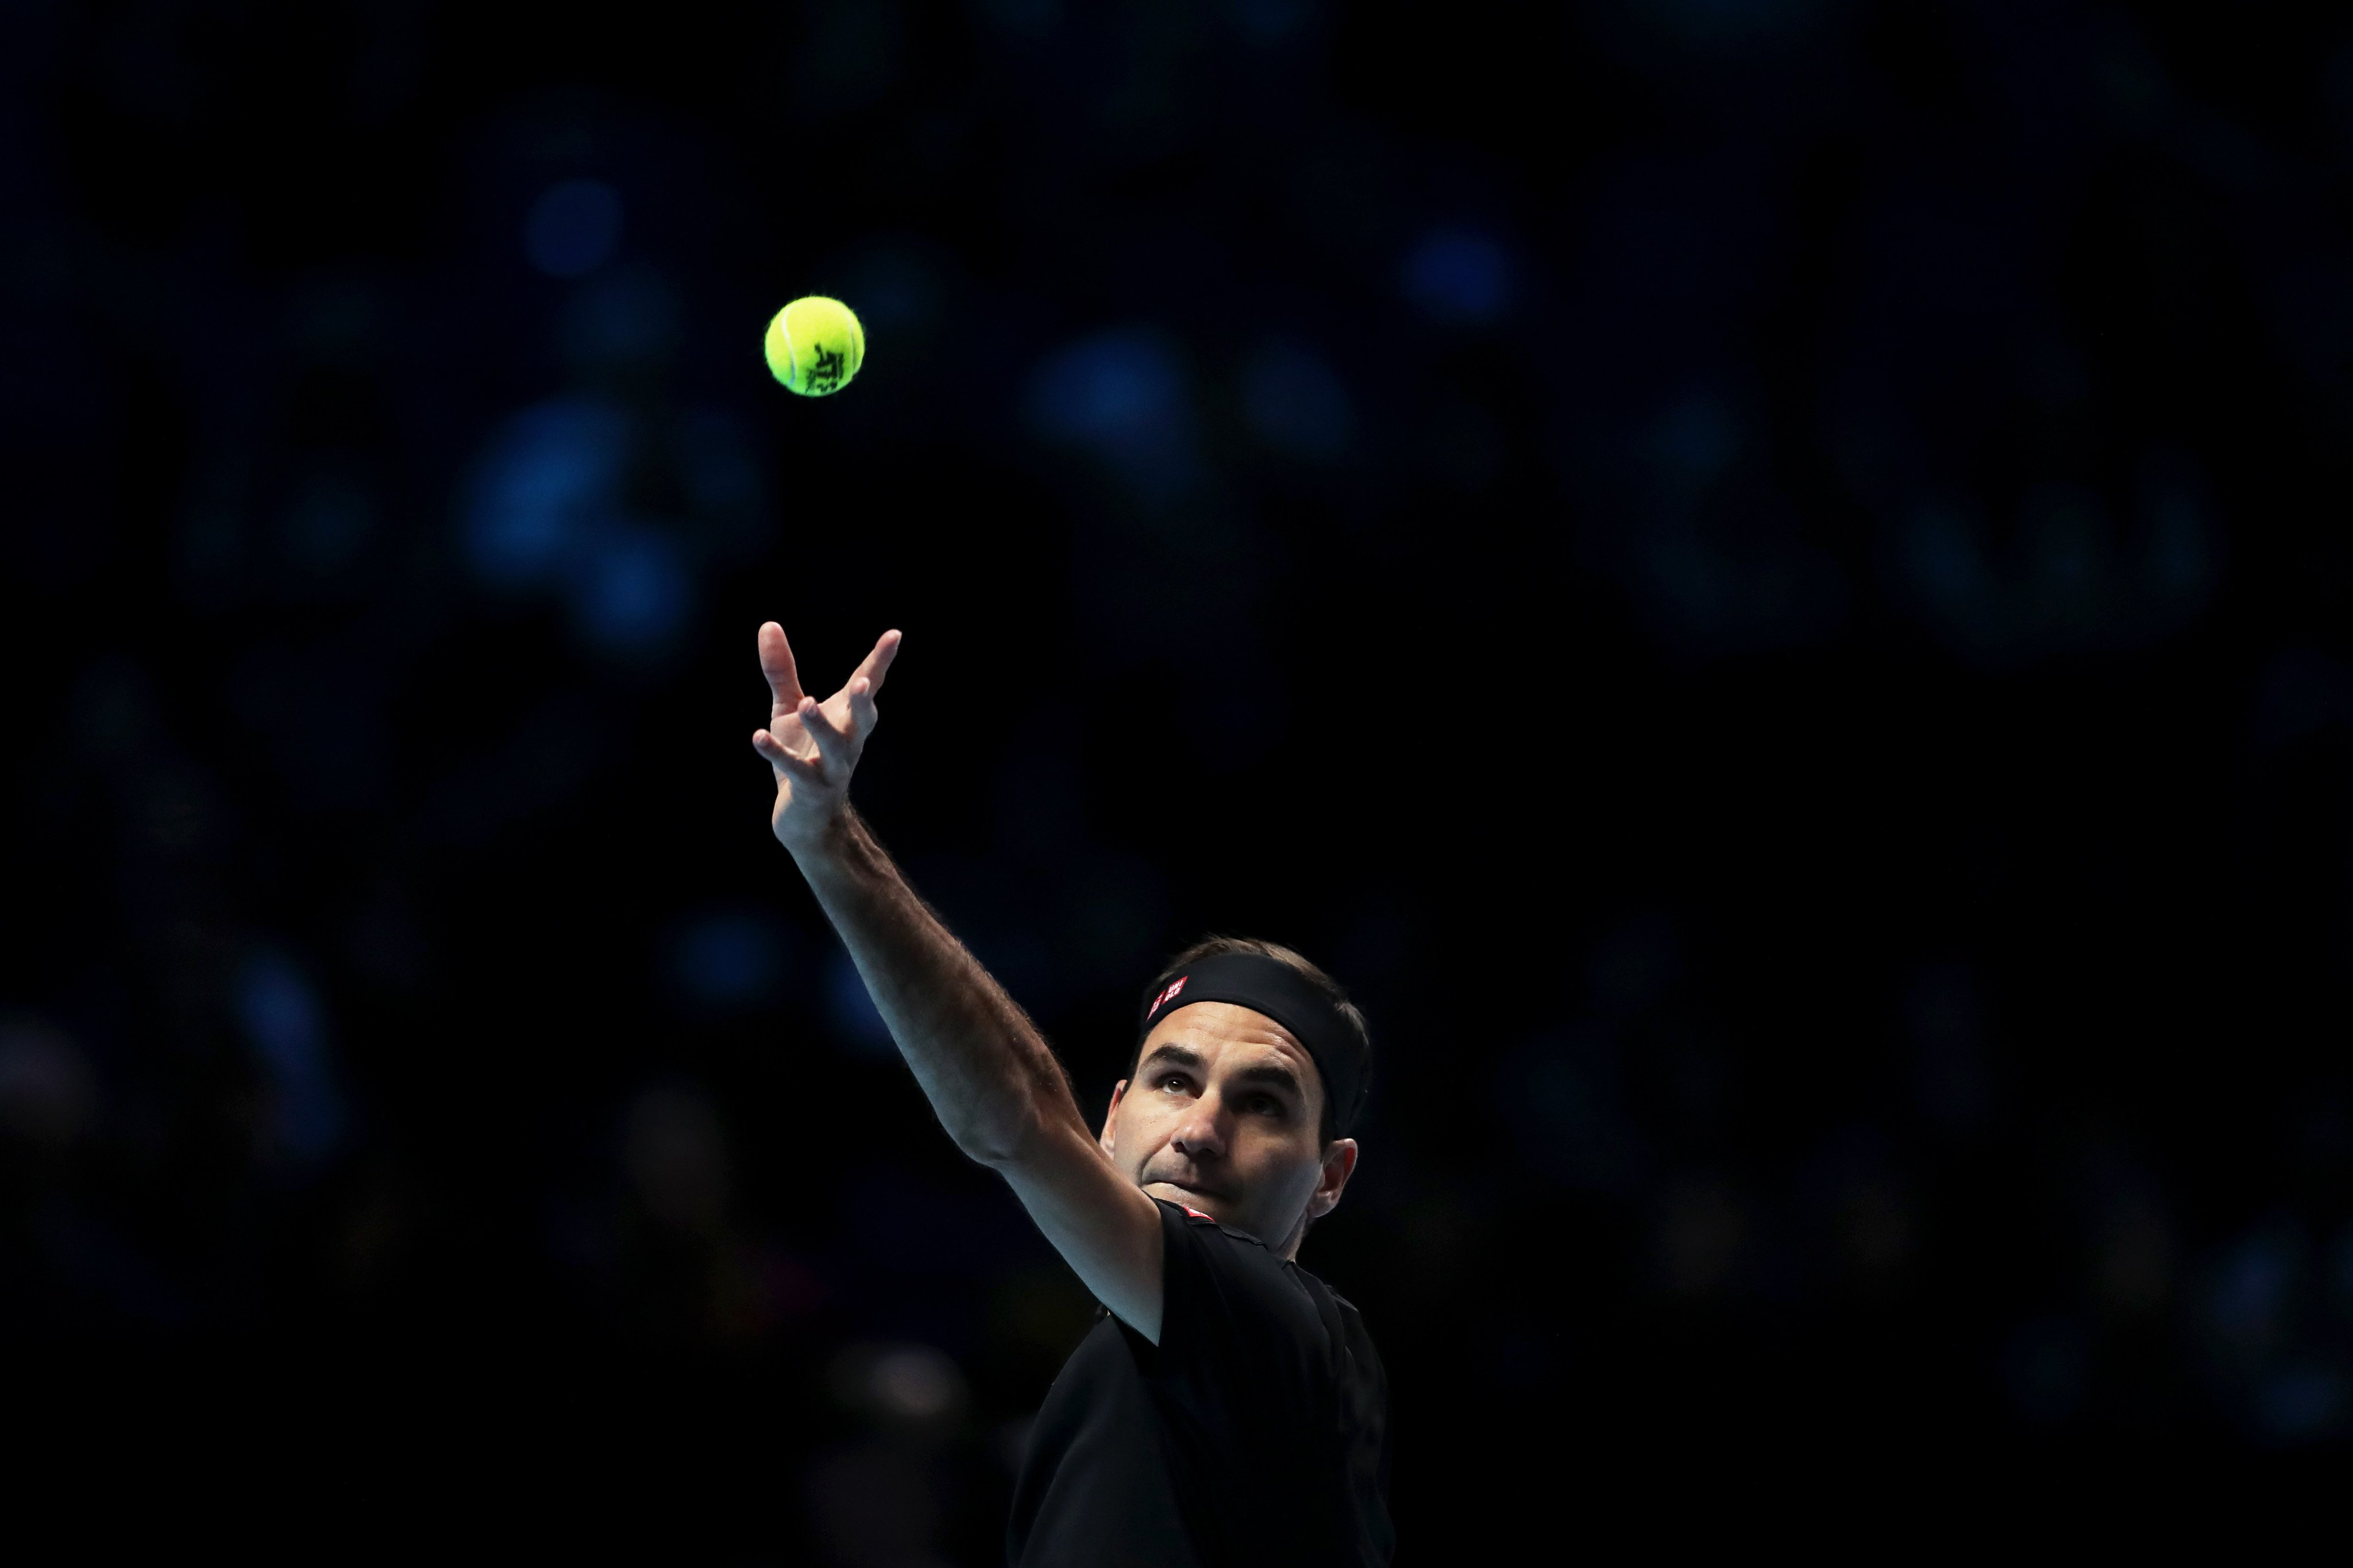 ATP-ամփոփիչ մրցաշար․ Ֆեդերերը խաղի մեջ է․ շվեյցարացին երկու սեթում հաղթեց Բերետինիին